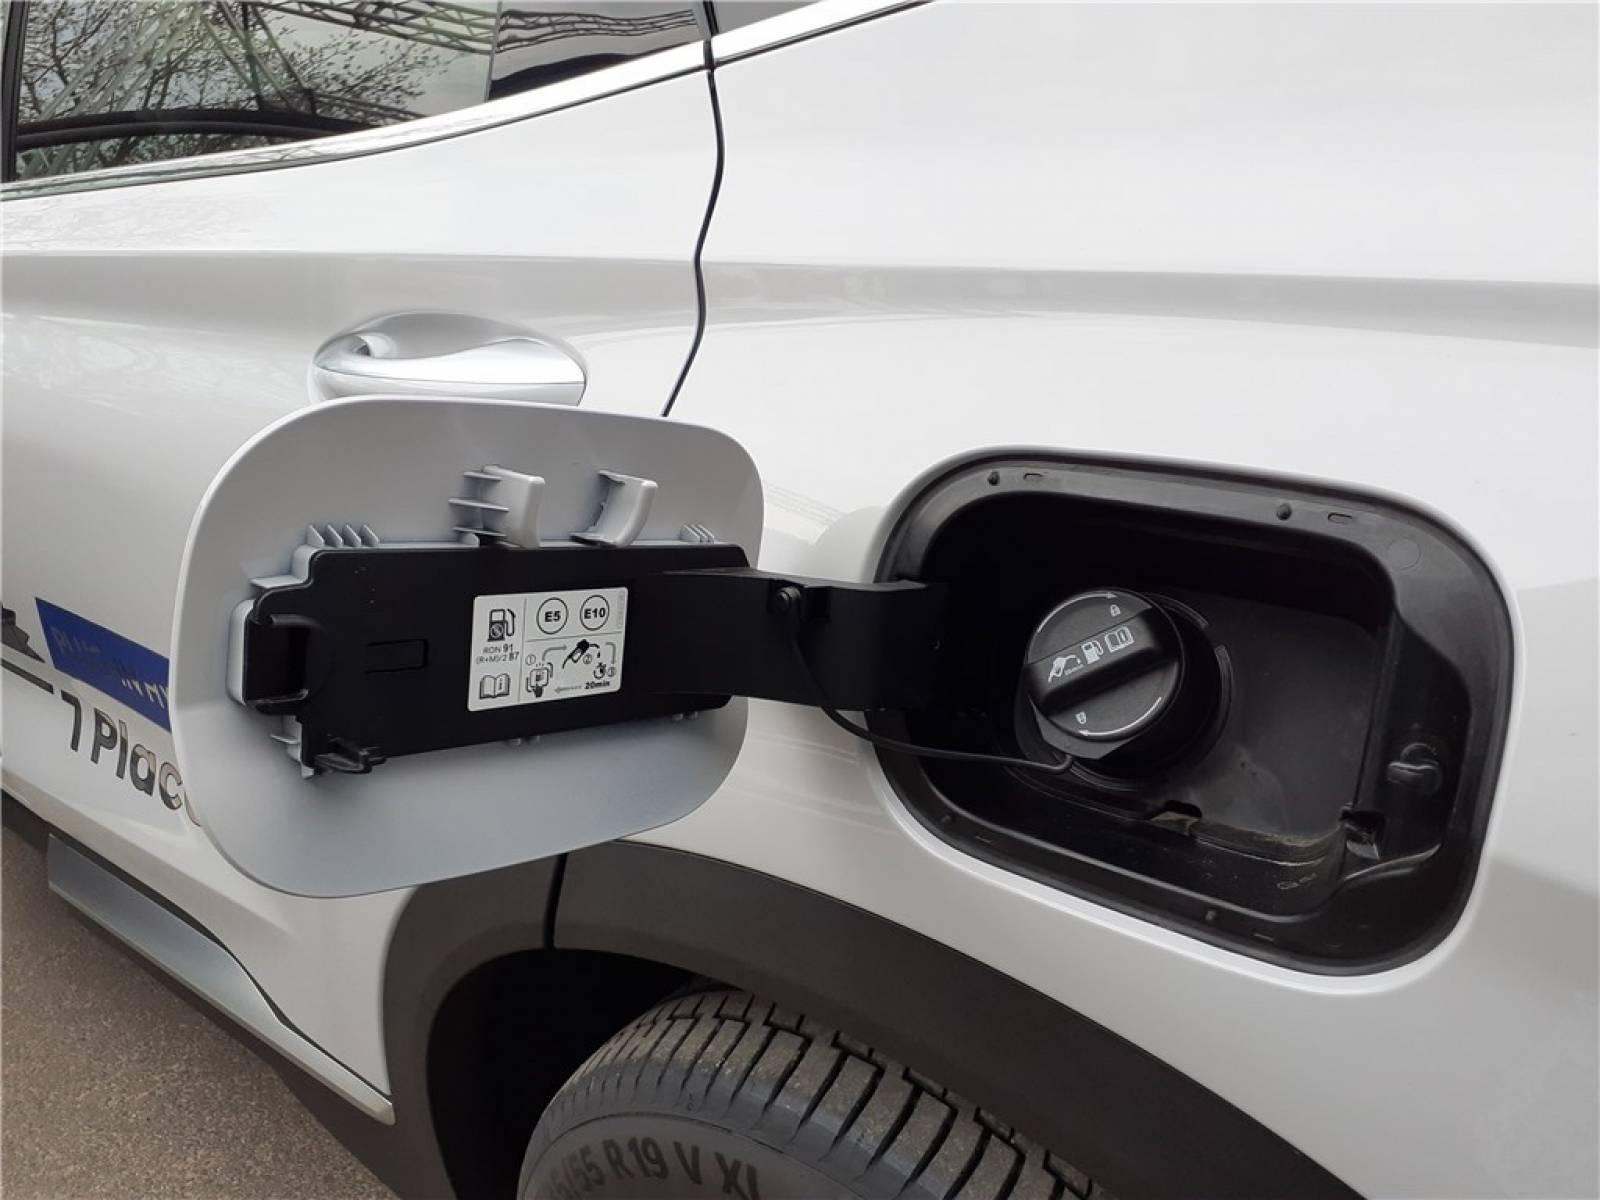 HYUNDAI Santa Fé 1.6 T-GDi Plug-in 265 HTRAC BVA6 - véhicule d'occasion - Groupe Guillet - Chalon Automobiles - 71100 - Chalon-sur-Saône - 14